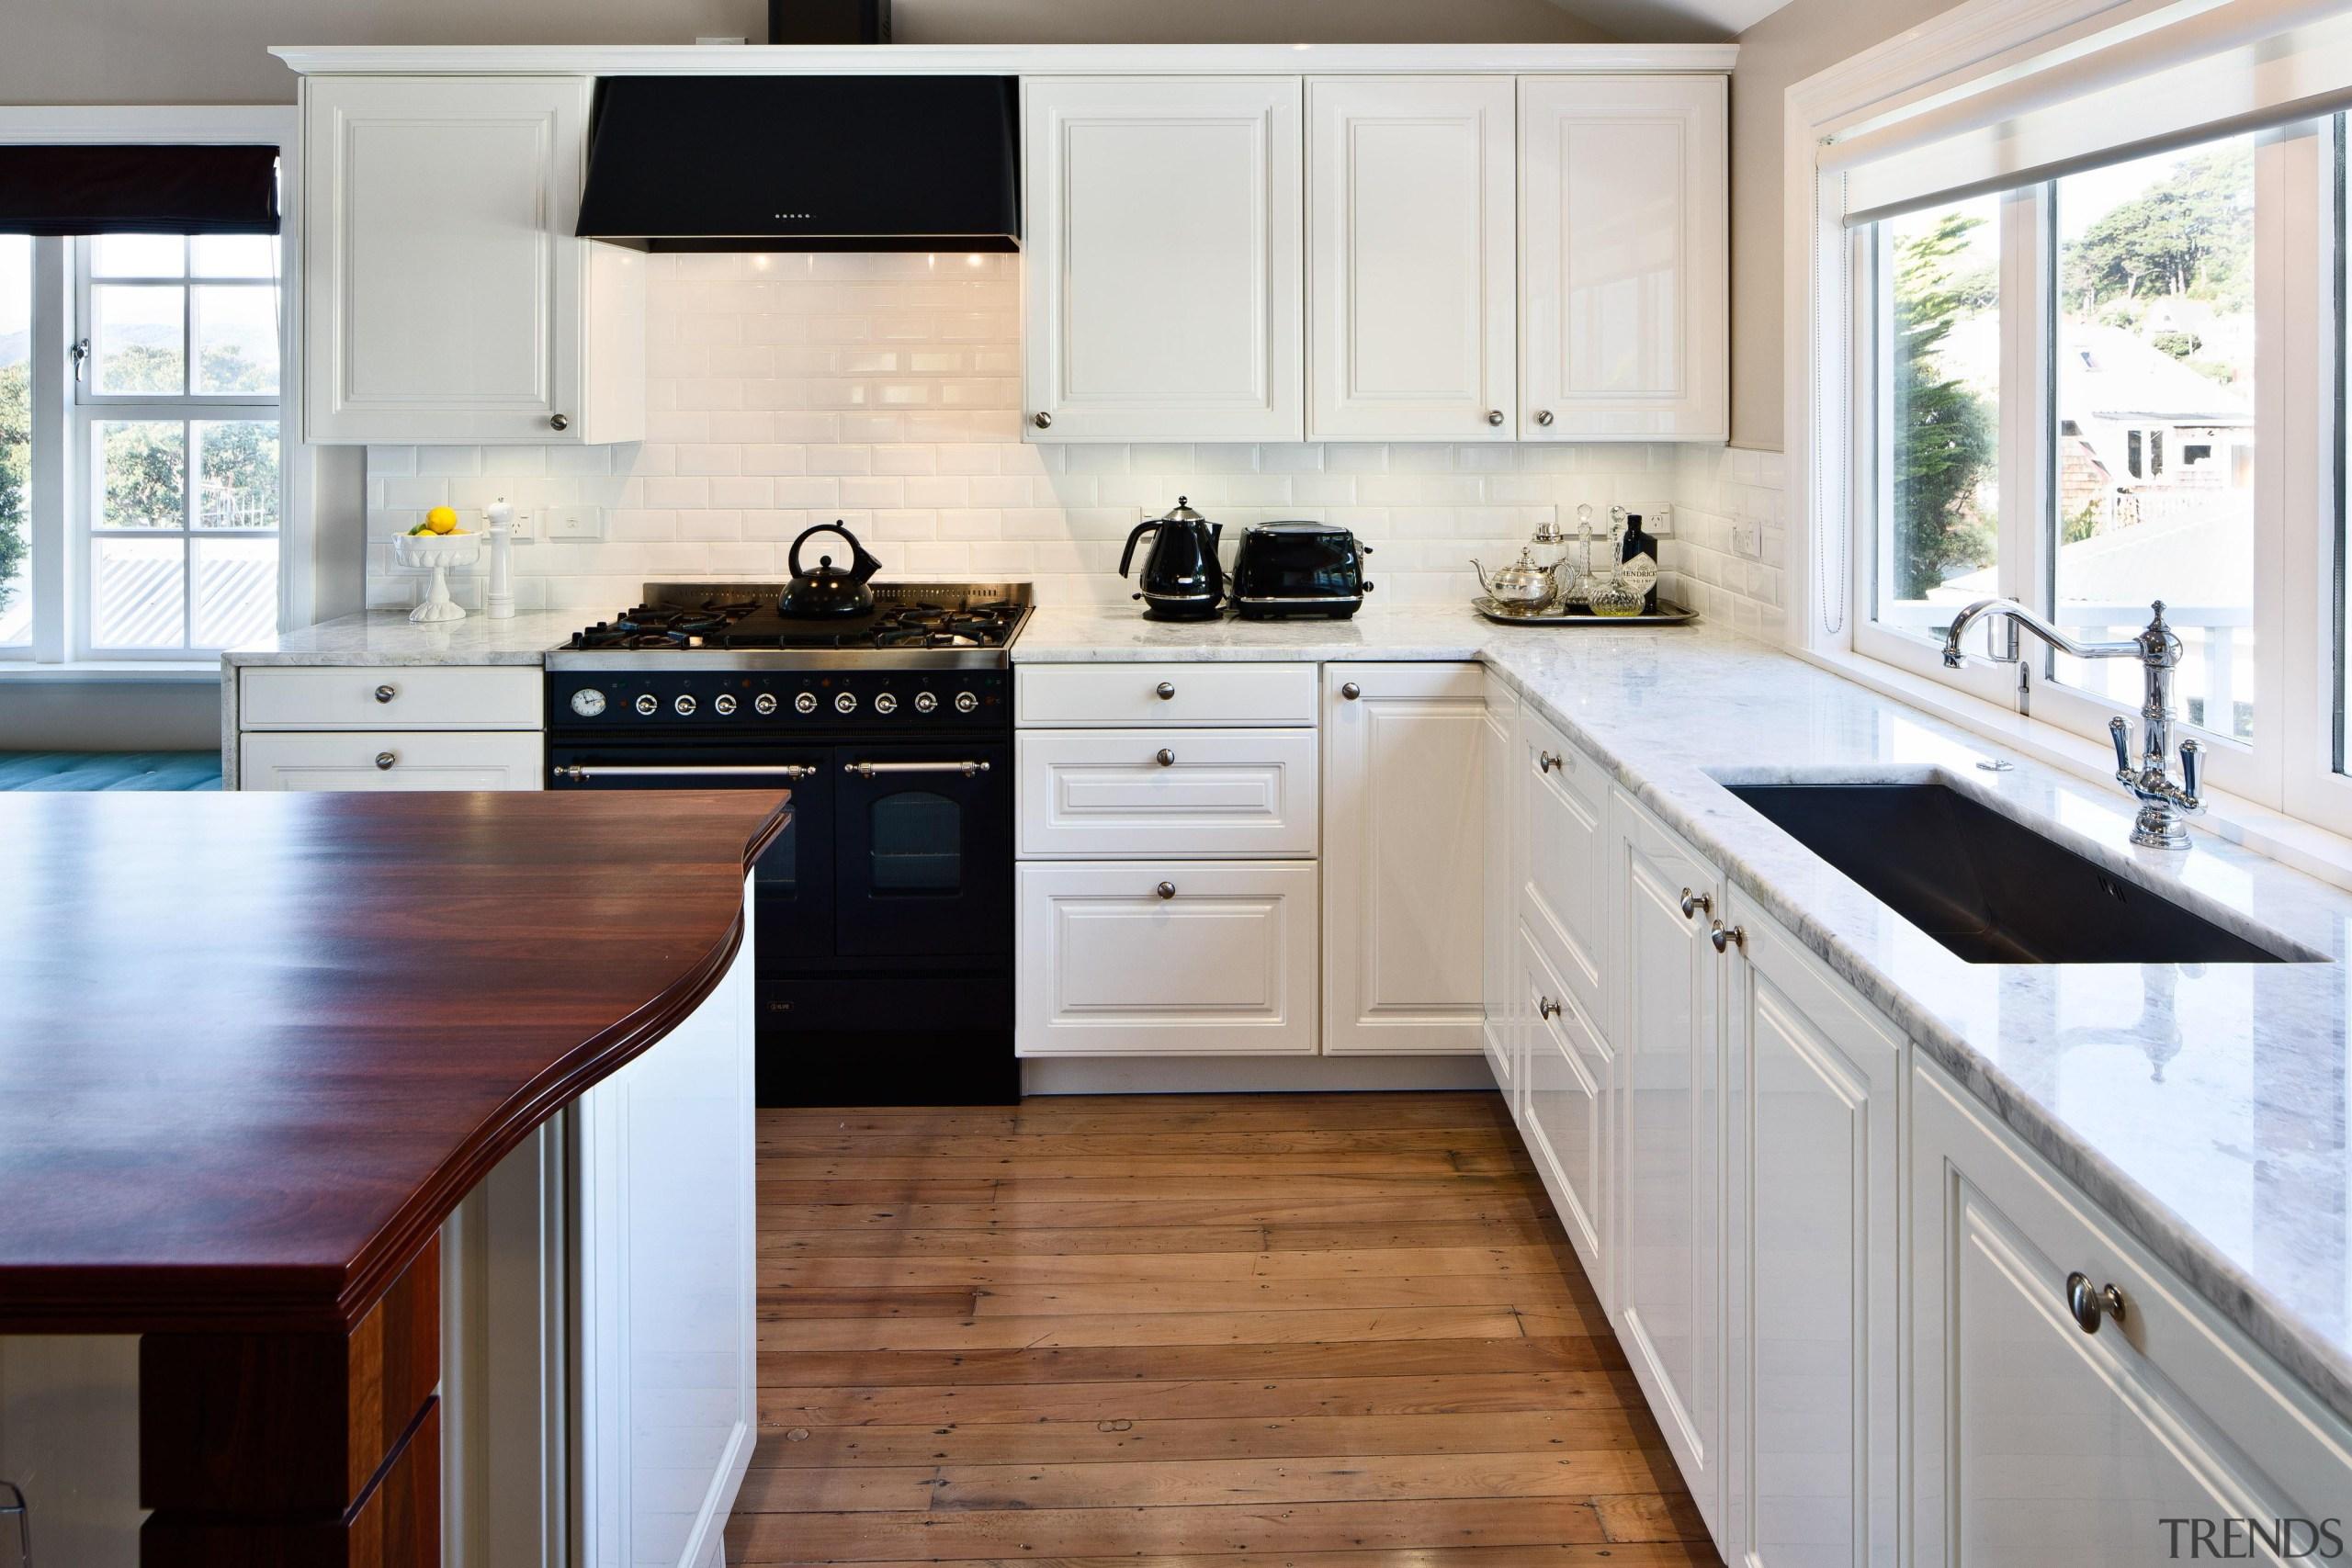 burnham1.jpg - burnham1.jpg - cabinetry   countertop   cabinetry, countertop, cuisine classique, floor, flooring, hardwood, interior design, kitchen, laminate flooring, room, wood, wood flooring, white